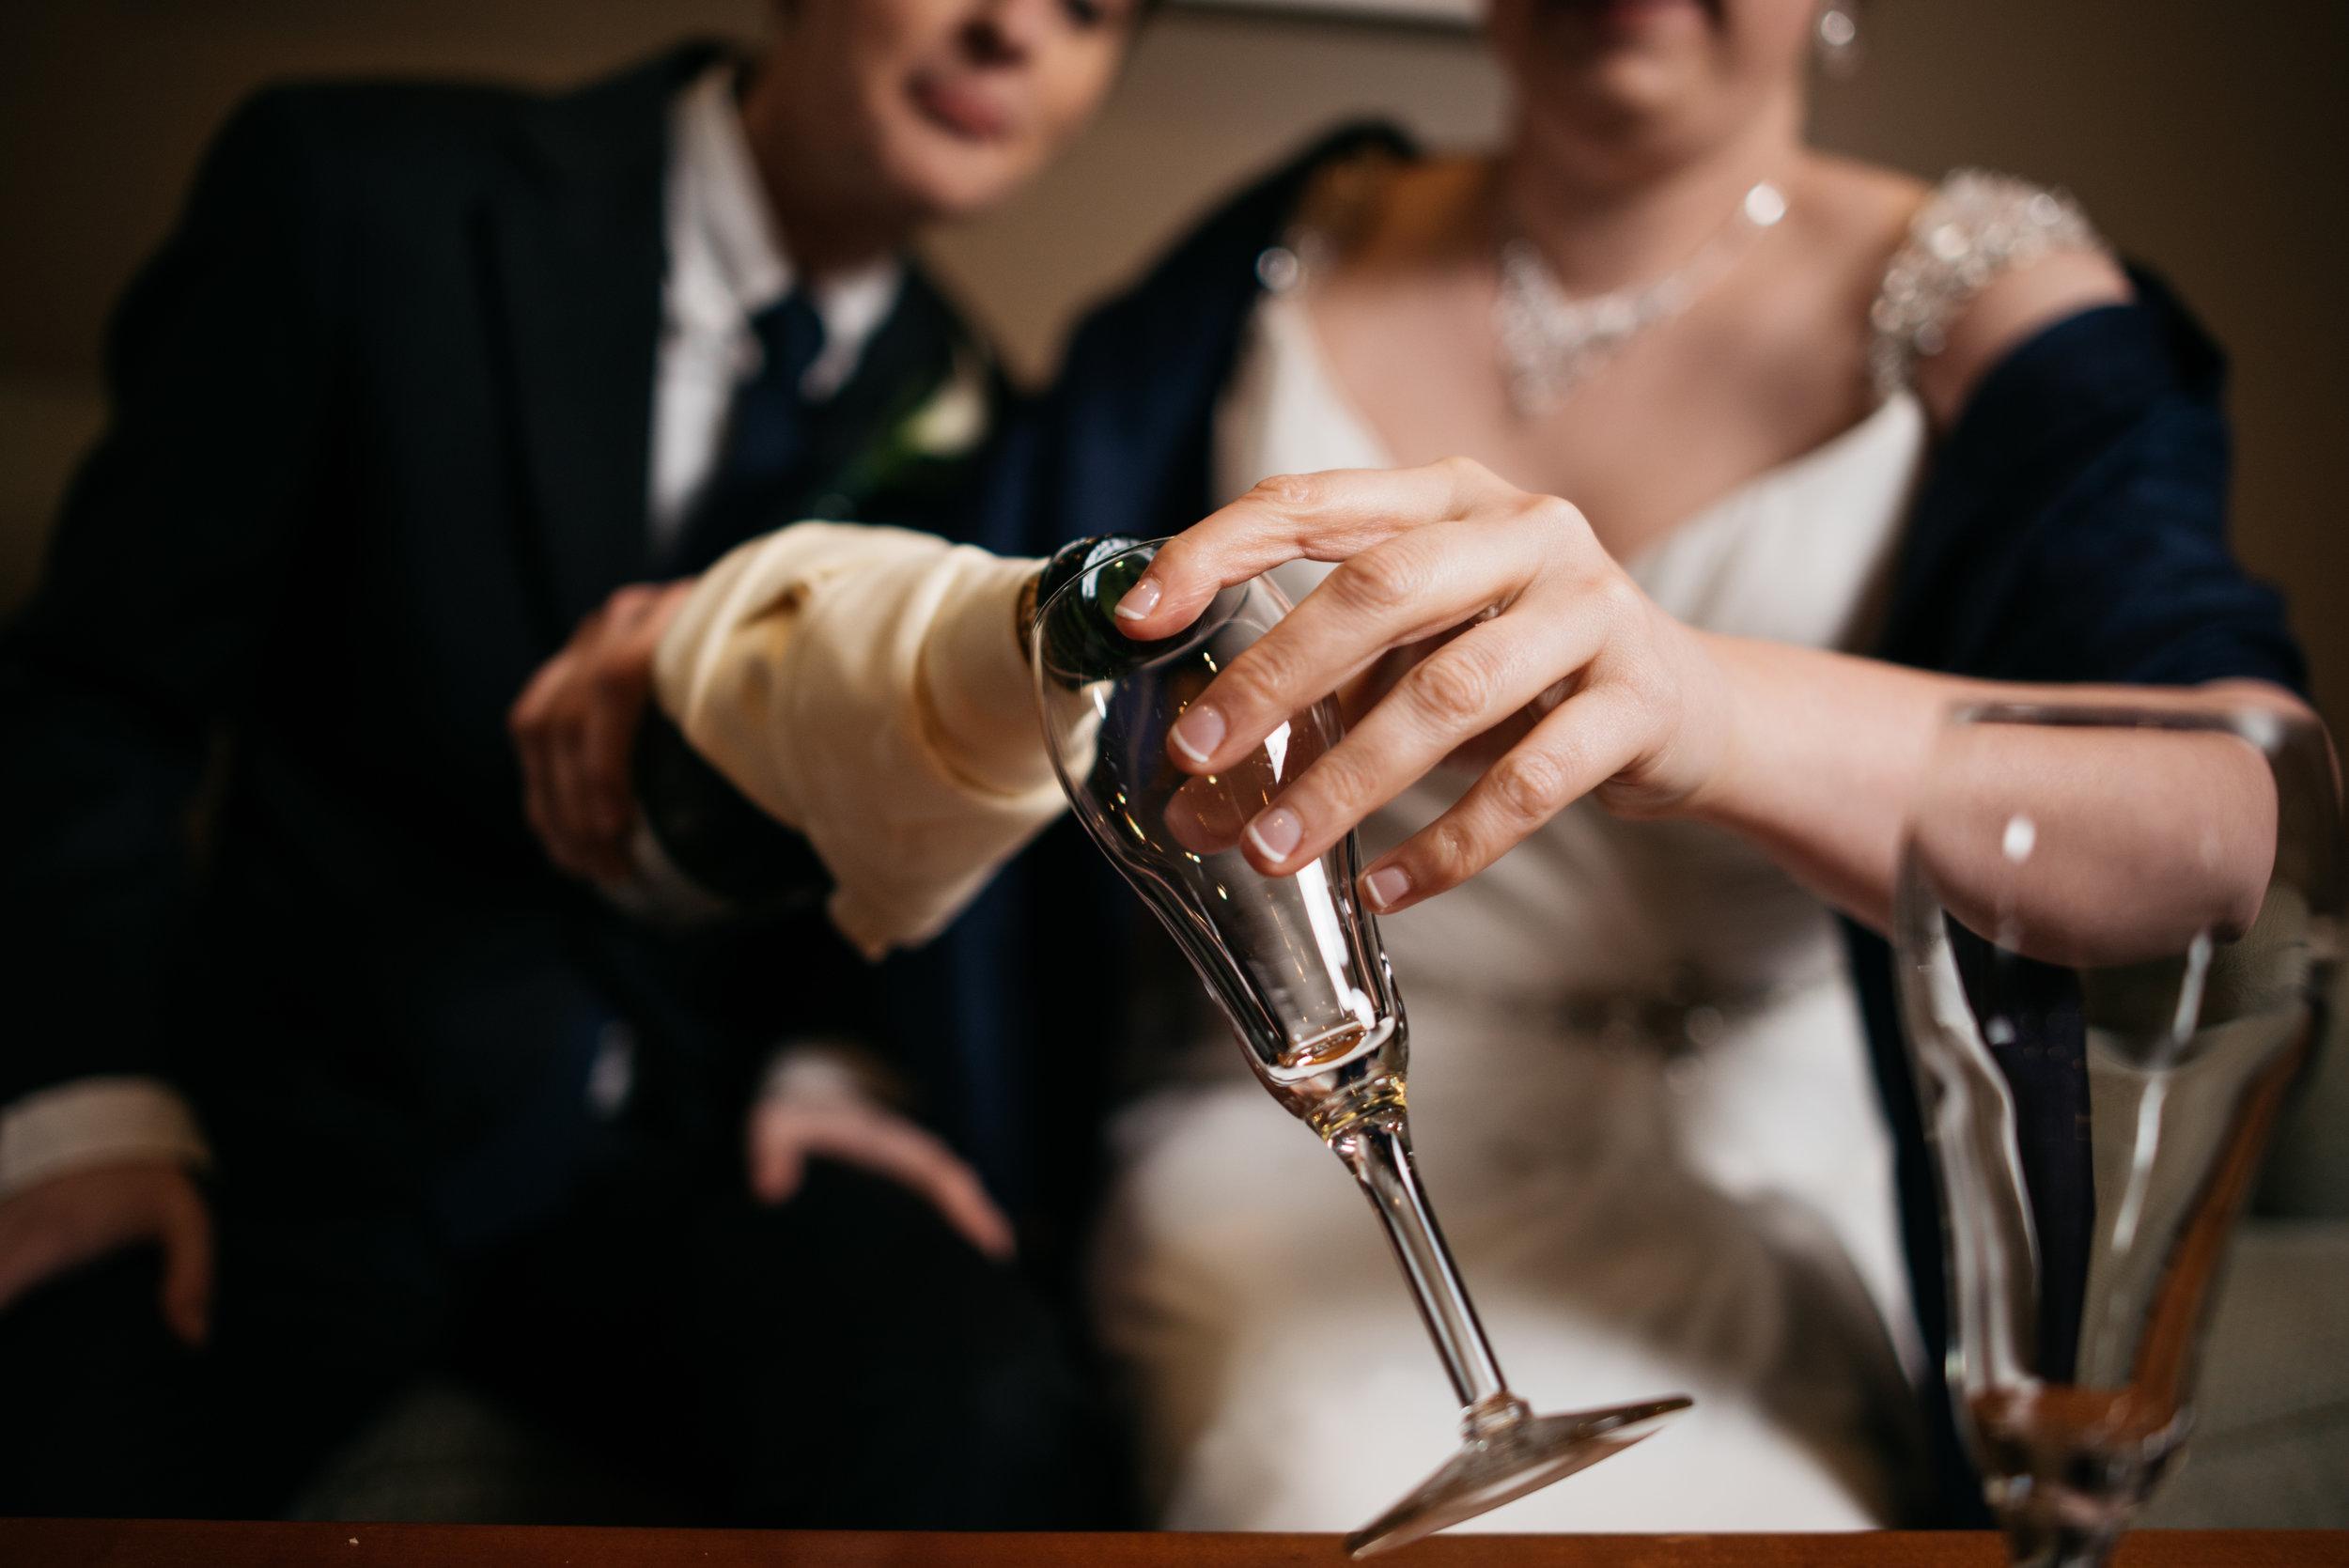 WeddingPhotos | NJPhotographer | Highlights-2-3.jpg